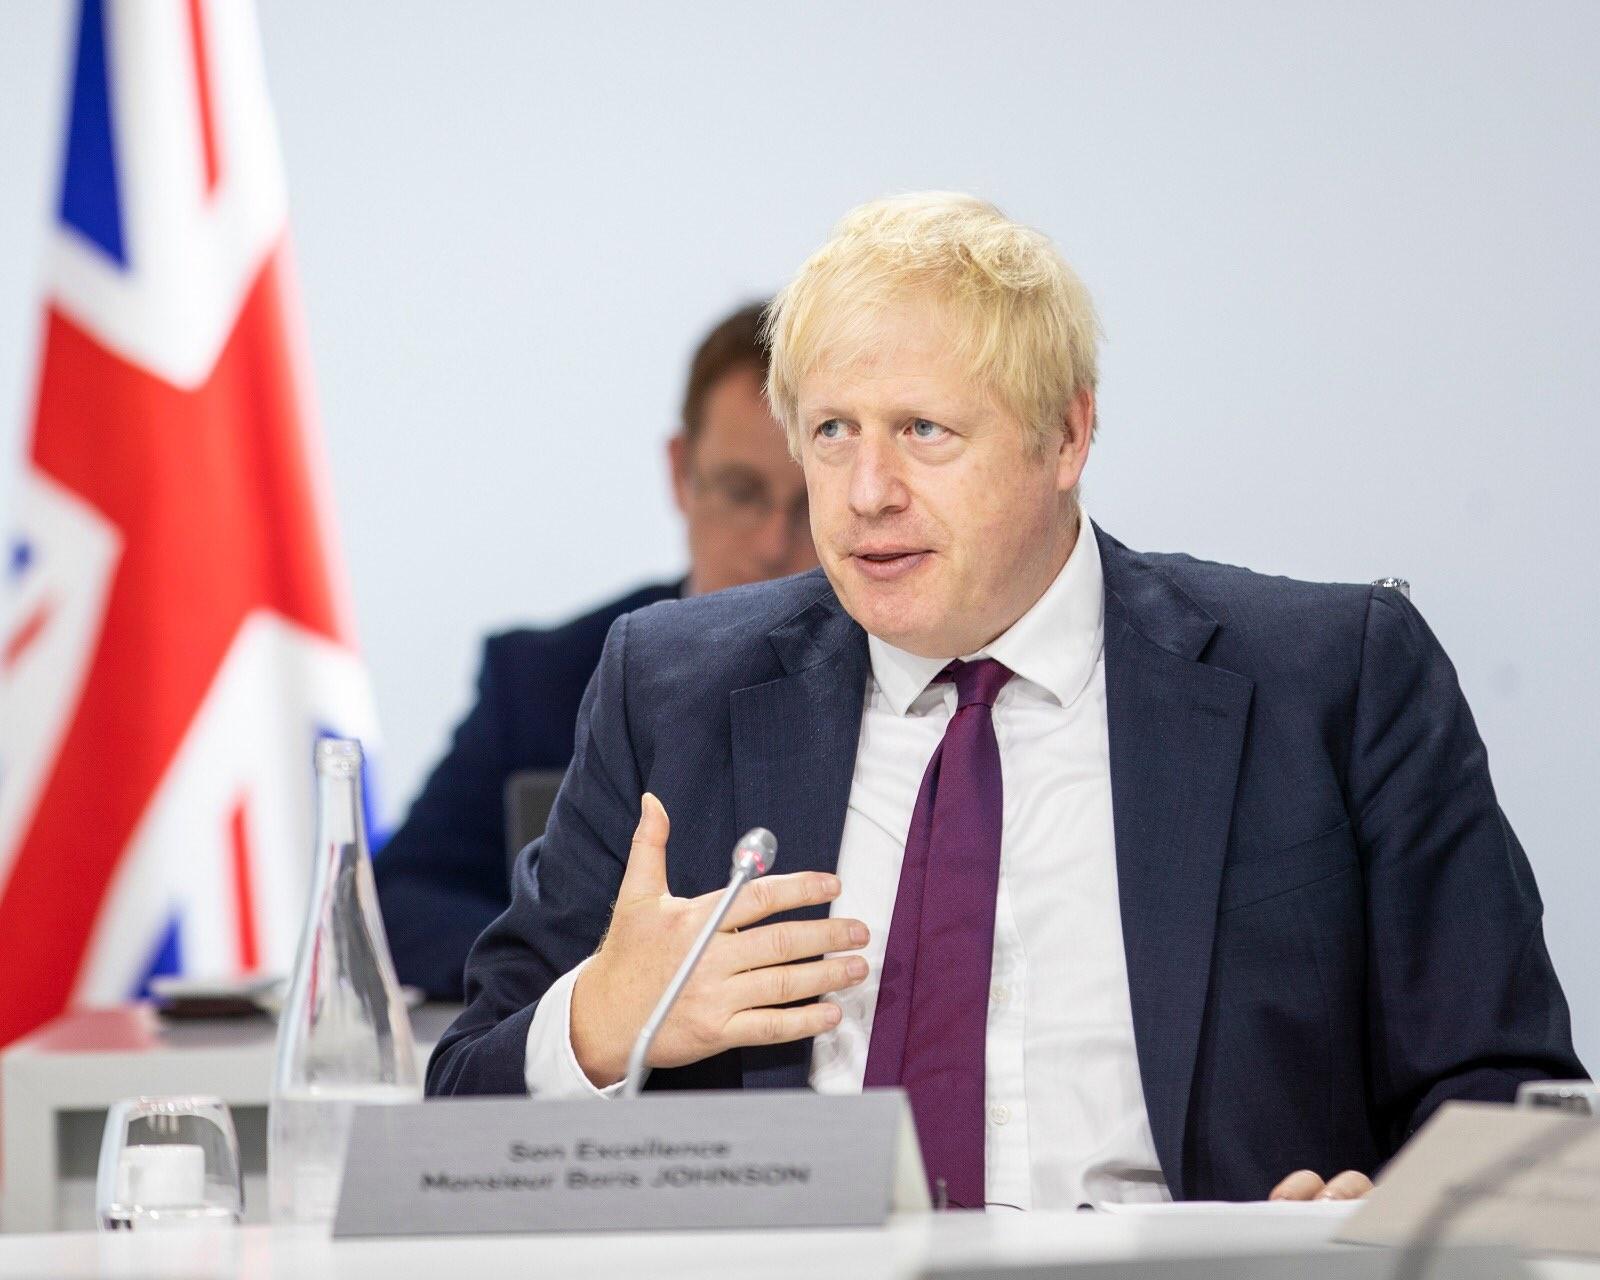 "<p>Фото © Twitter / <a href=""https://twitter.com/BorisJohnson"" target=""_self""><strong>Boris Johnson</strong></a></p>"